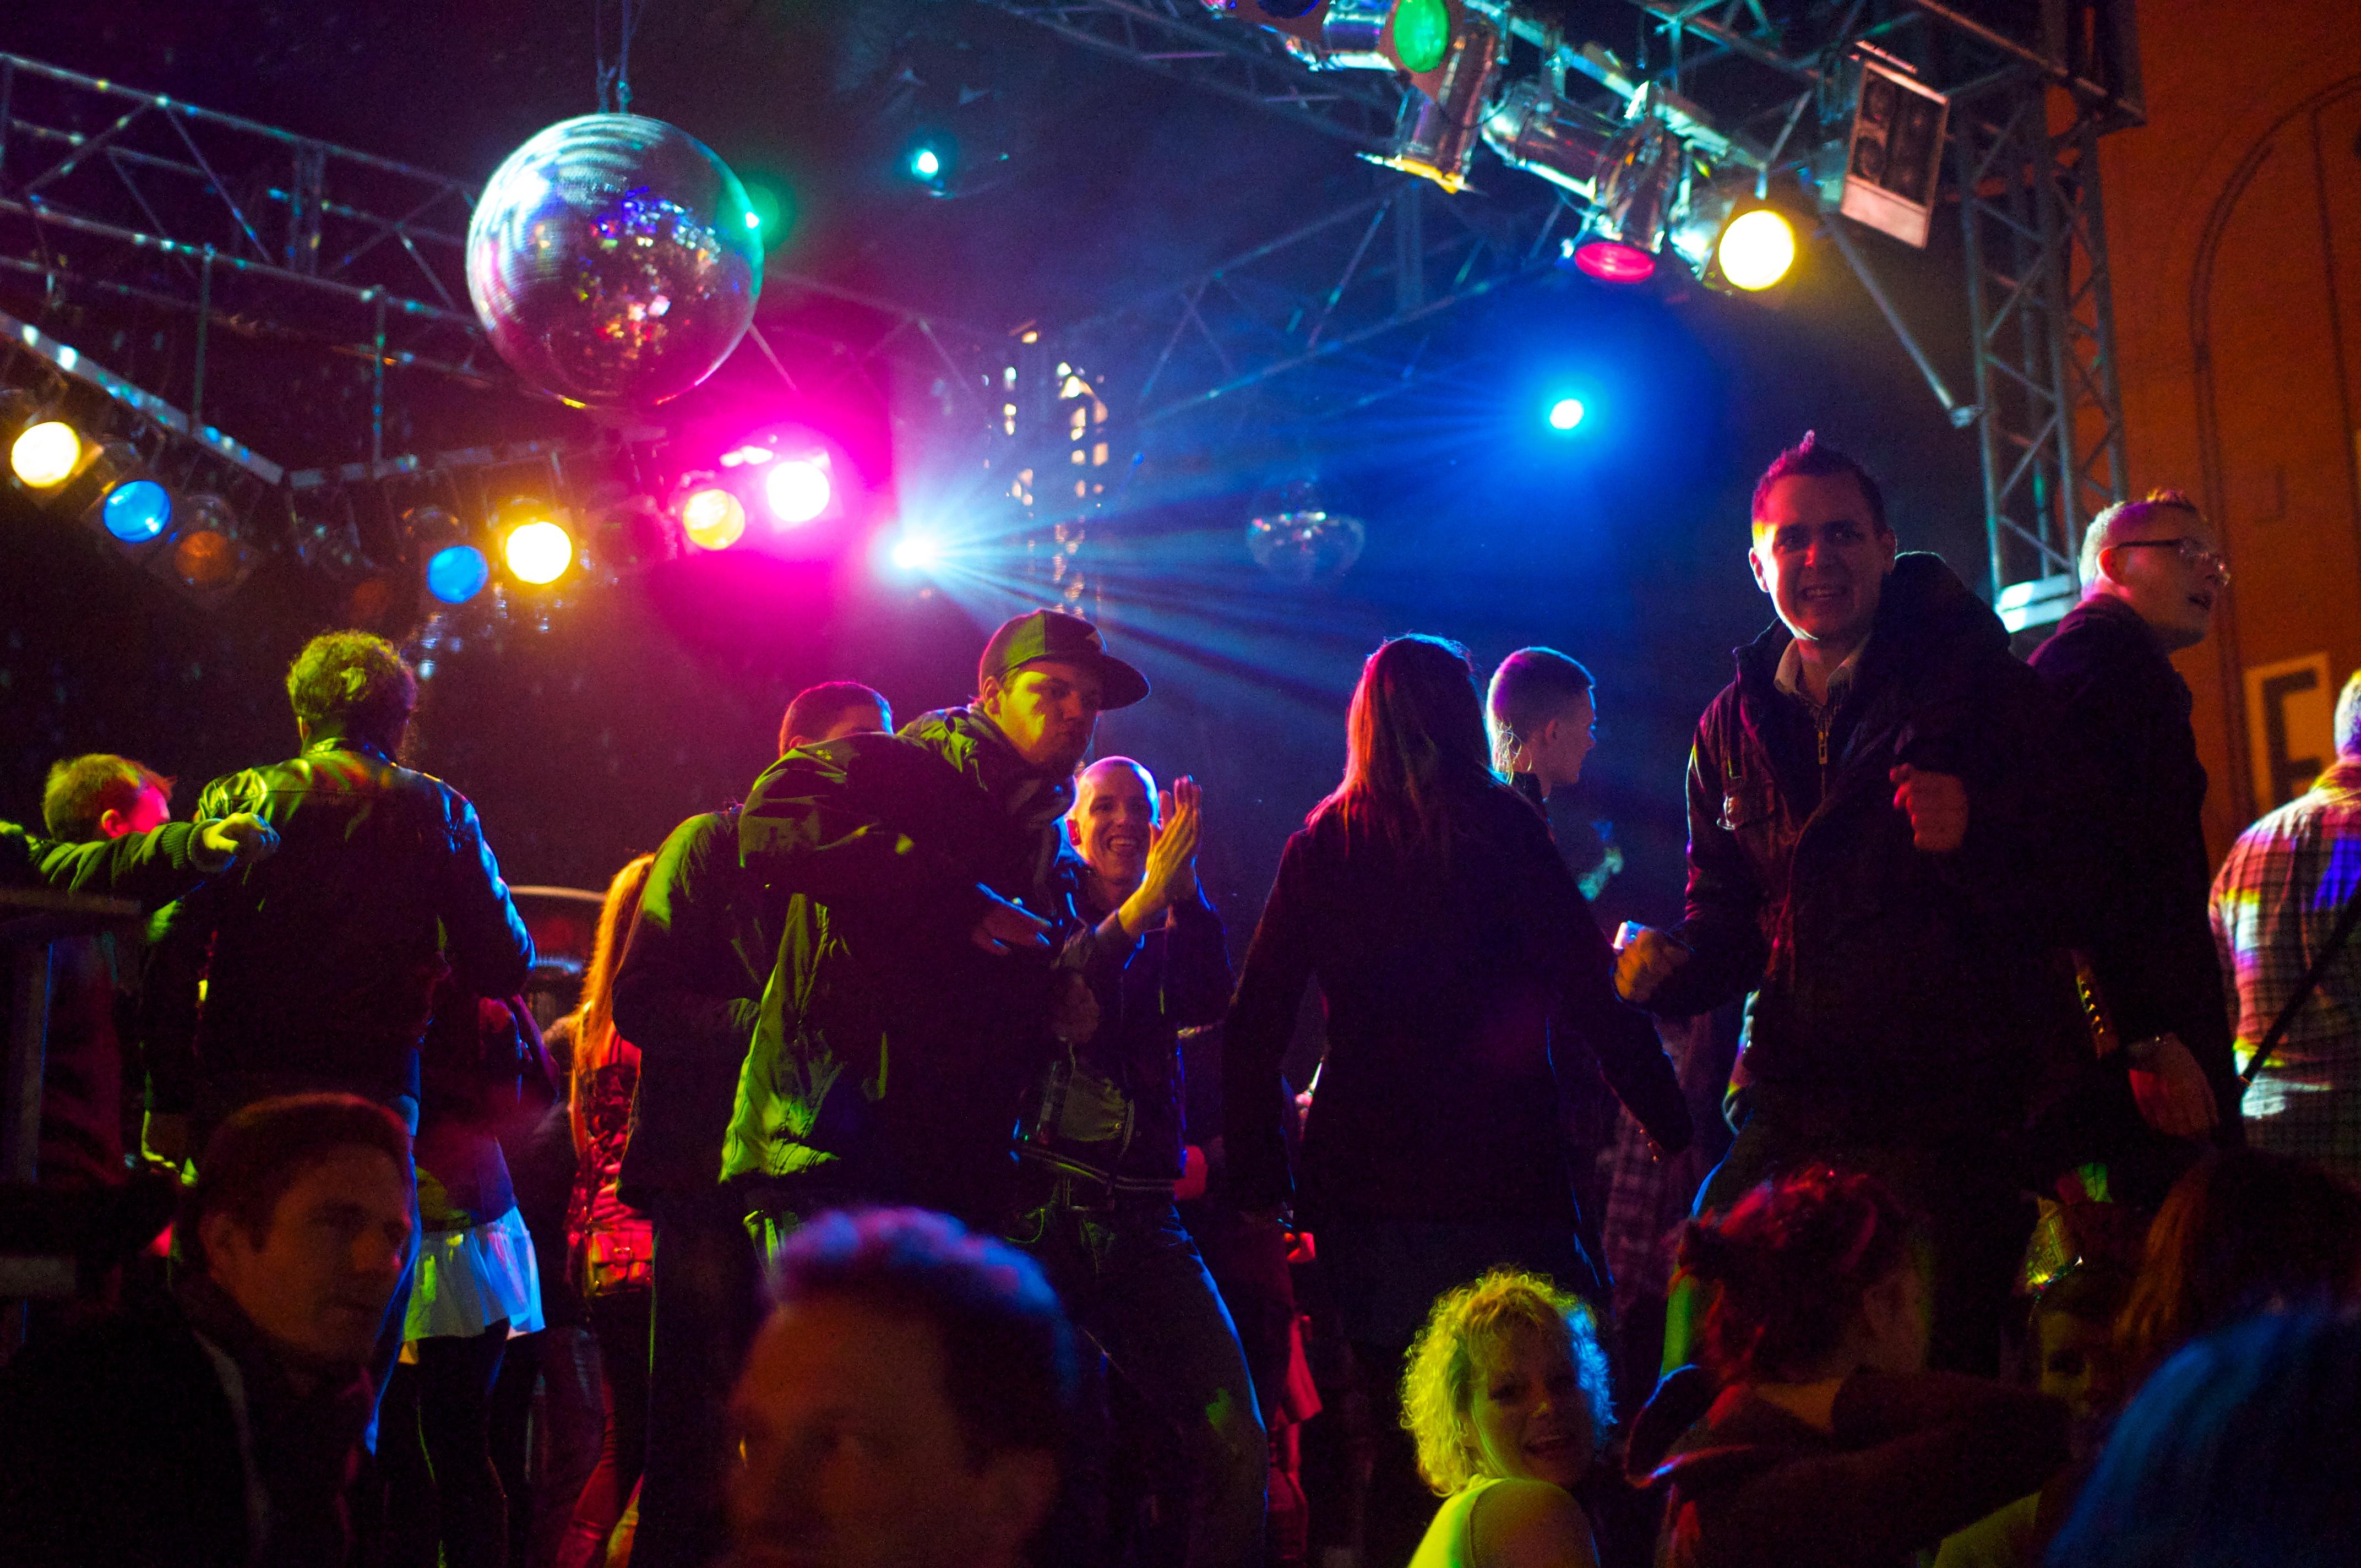 File:Disco dance.jpg - Wikimedia Commons